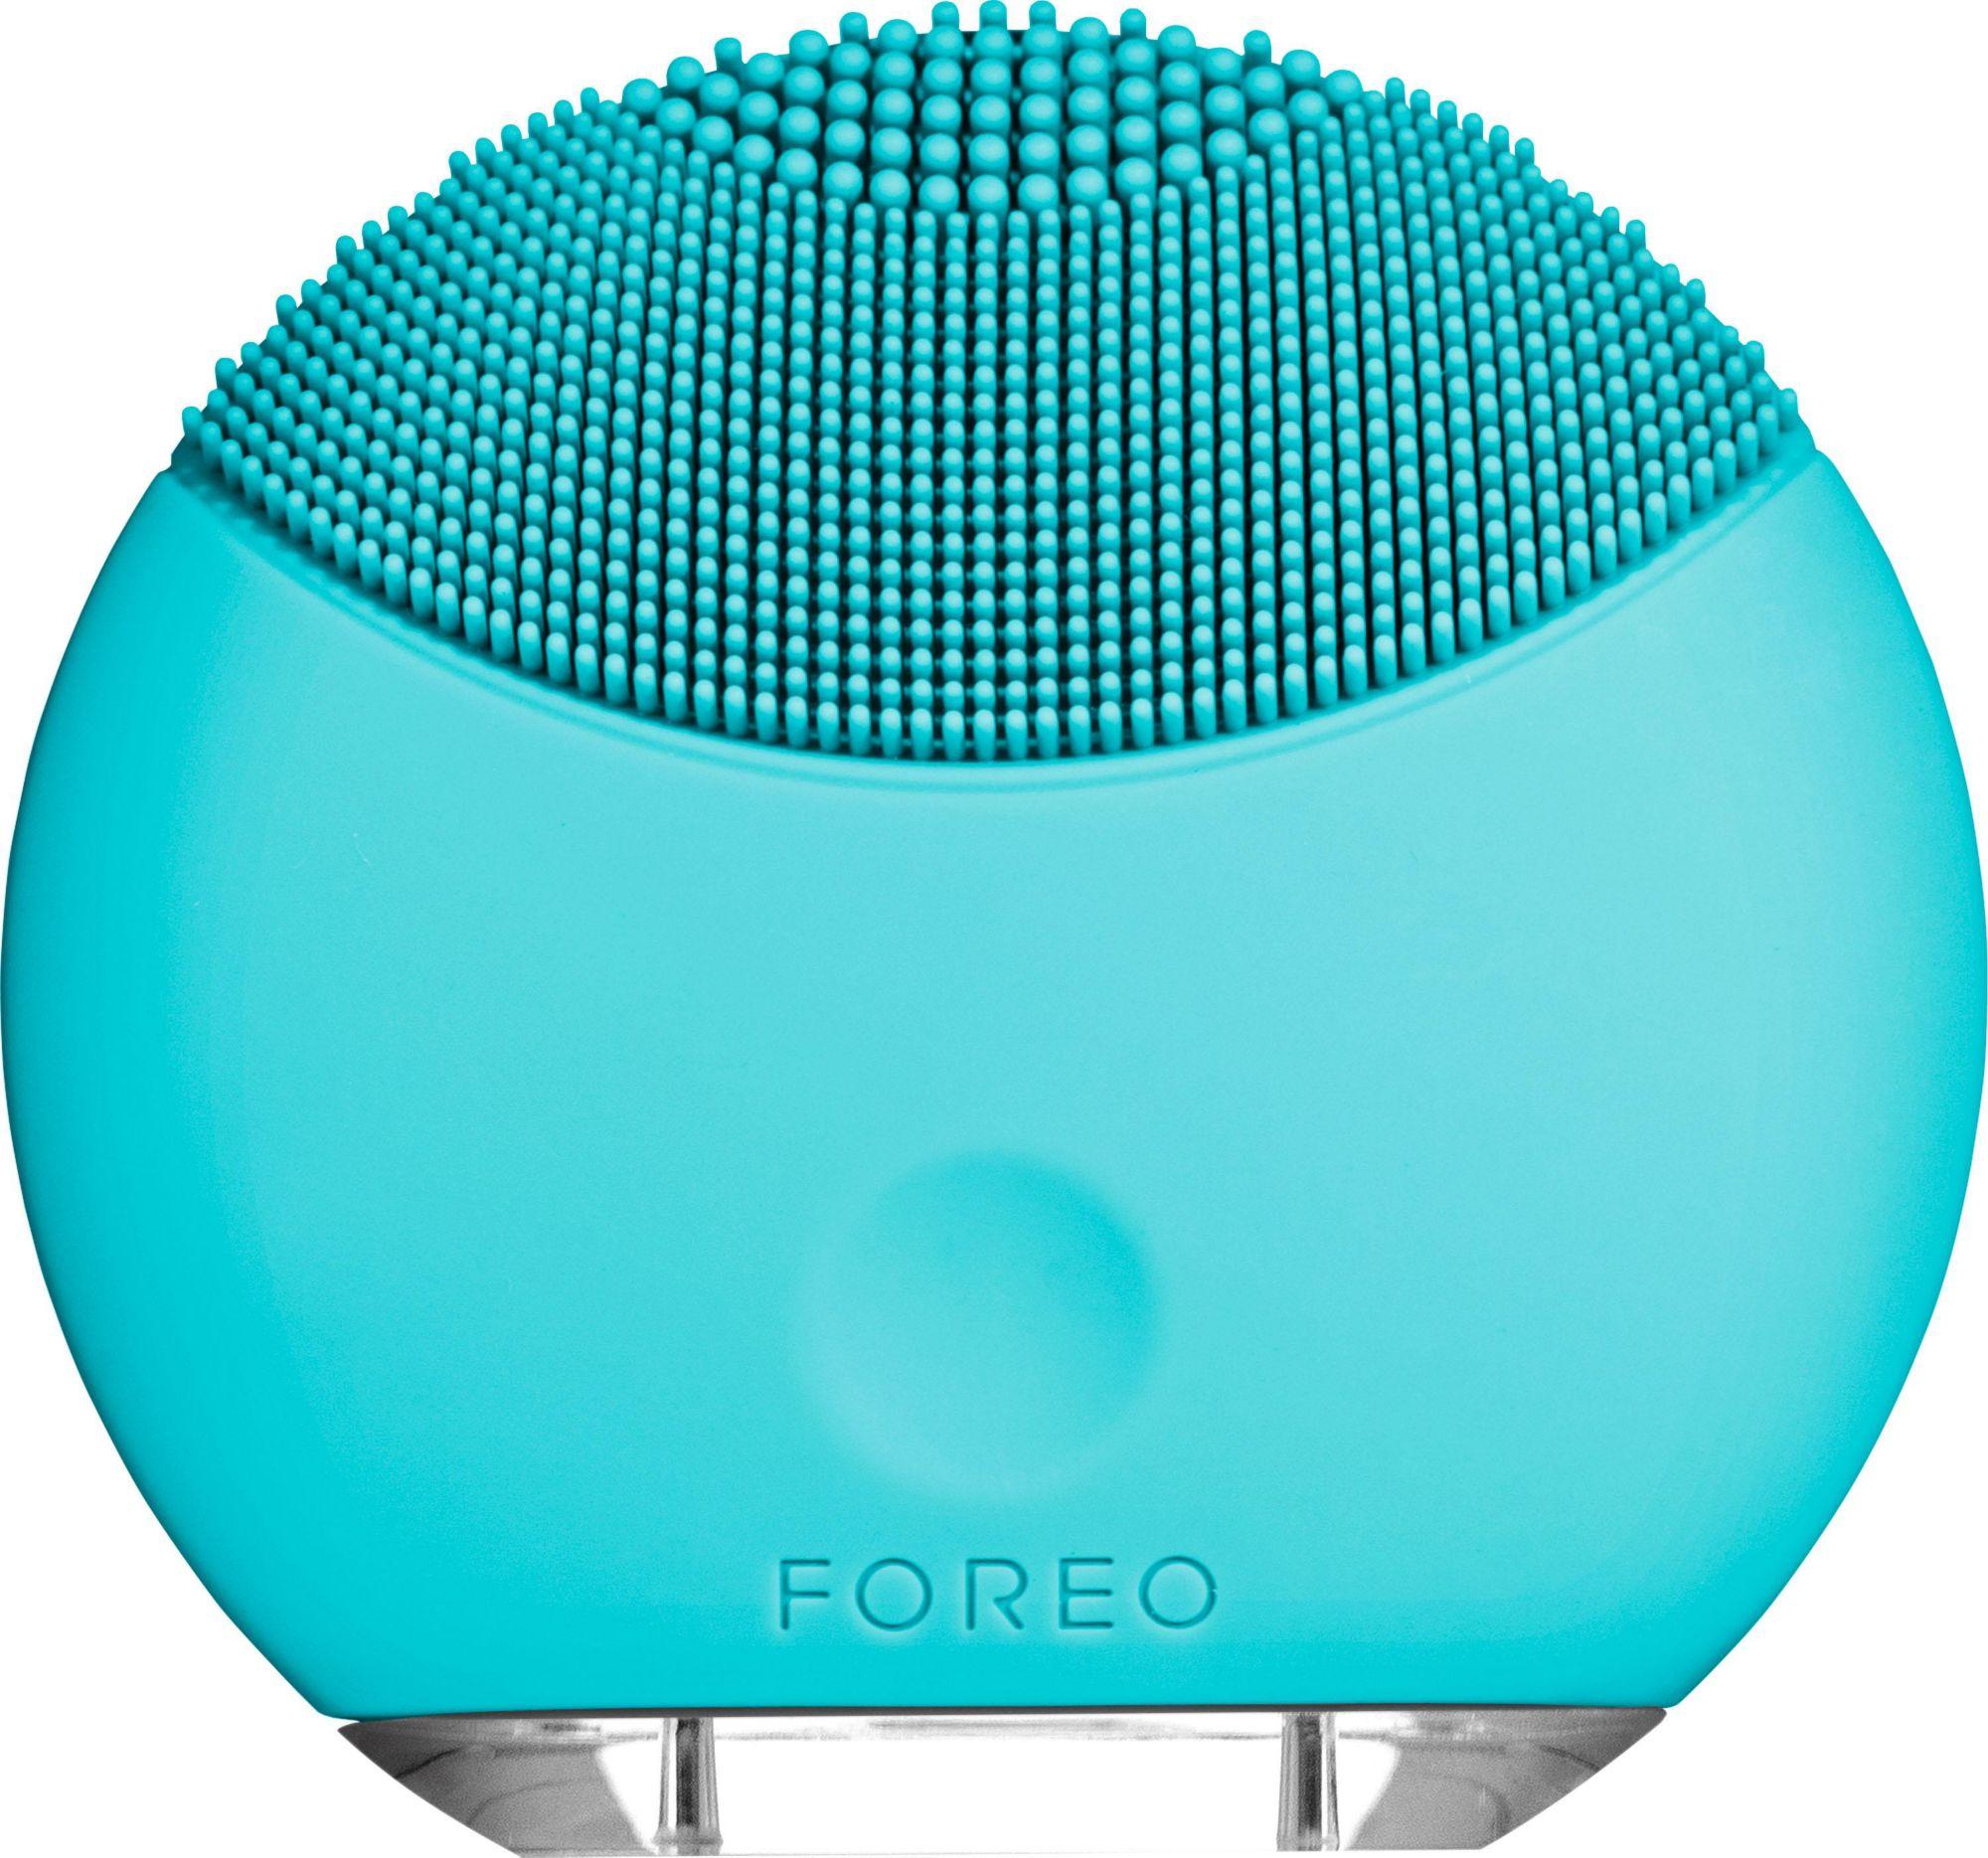 FOREO Foreo Gesichtsreinigungsbürste LUNA? mini Turquoise Blue, kompakt & stylish